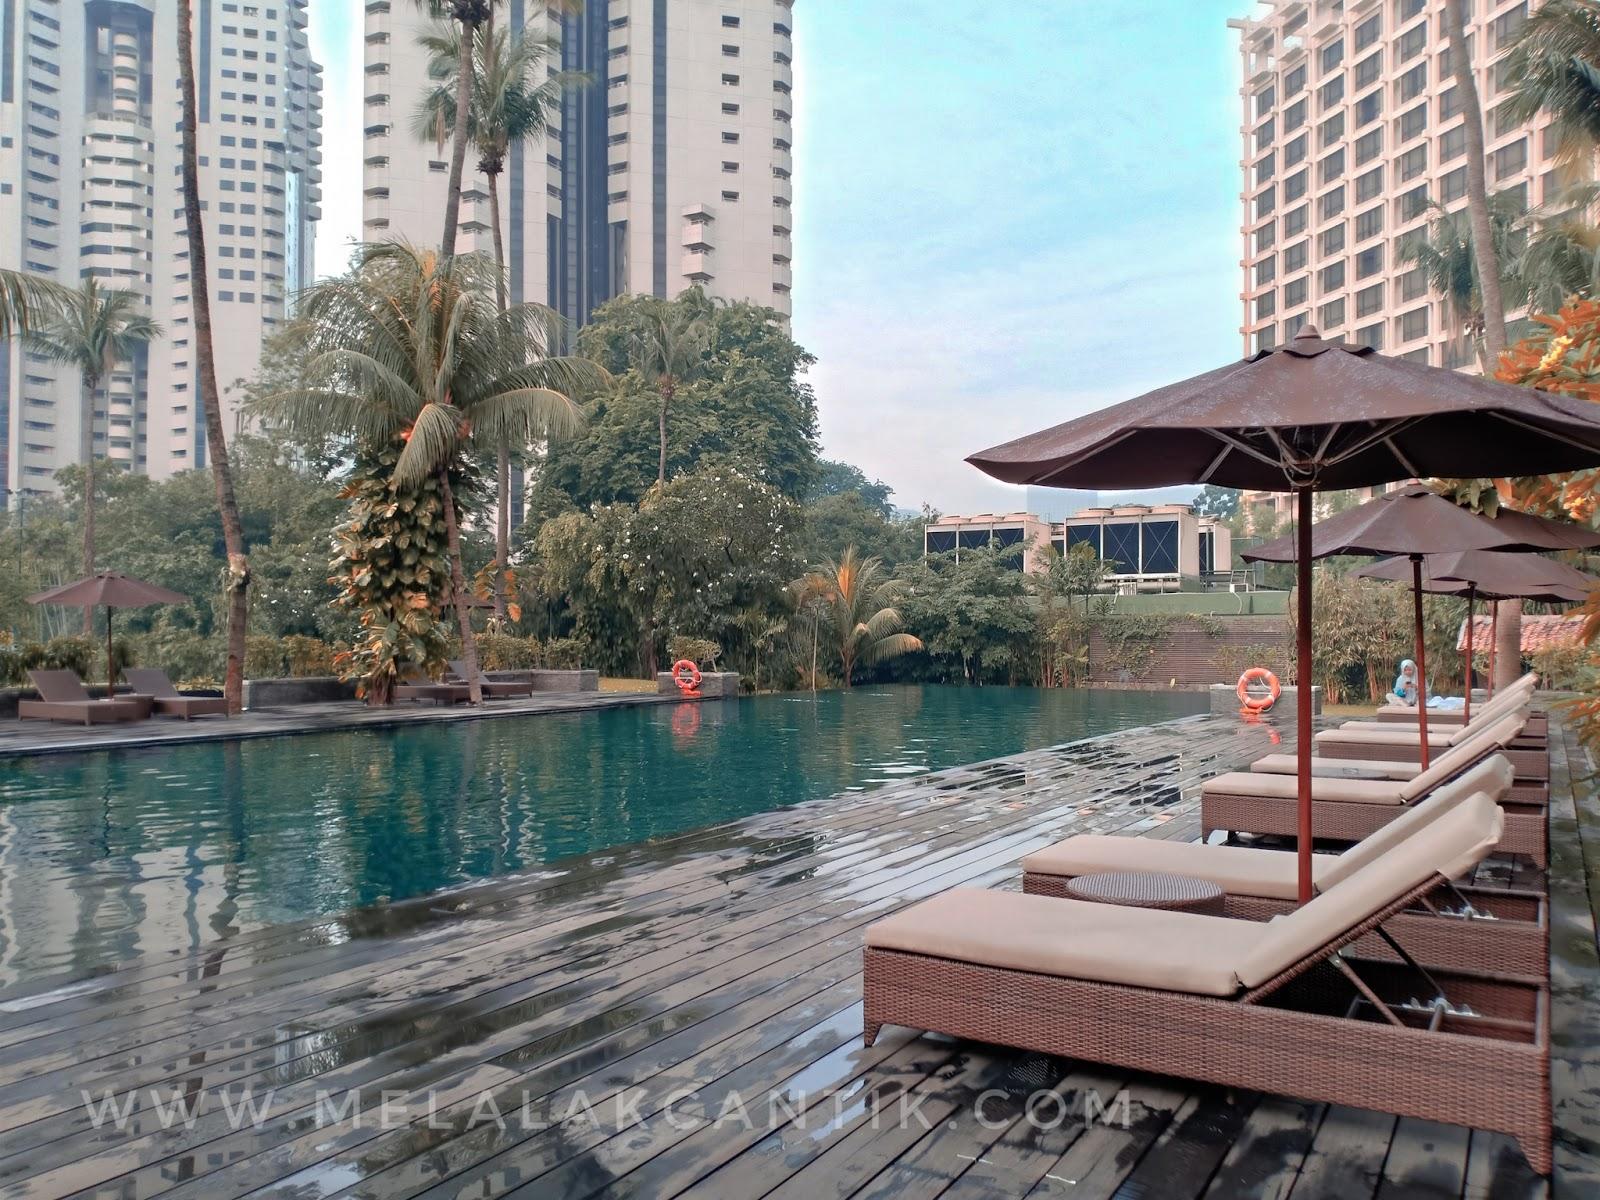 Dua Malam Indah Di The Sultan Hotel Residences Jakarta Travel Dan Lifestyle Blog